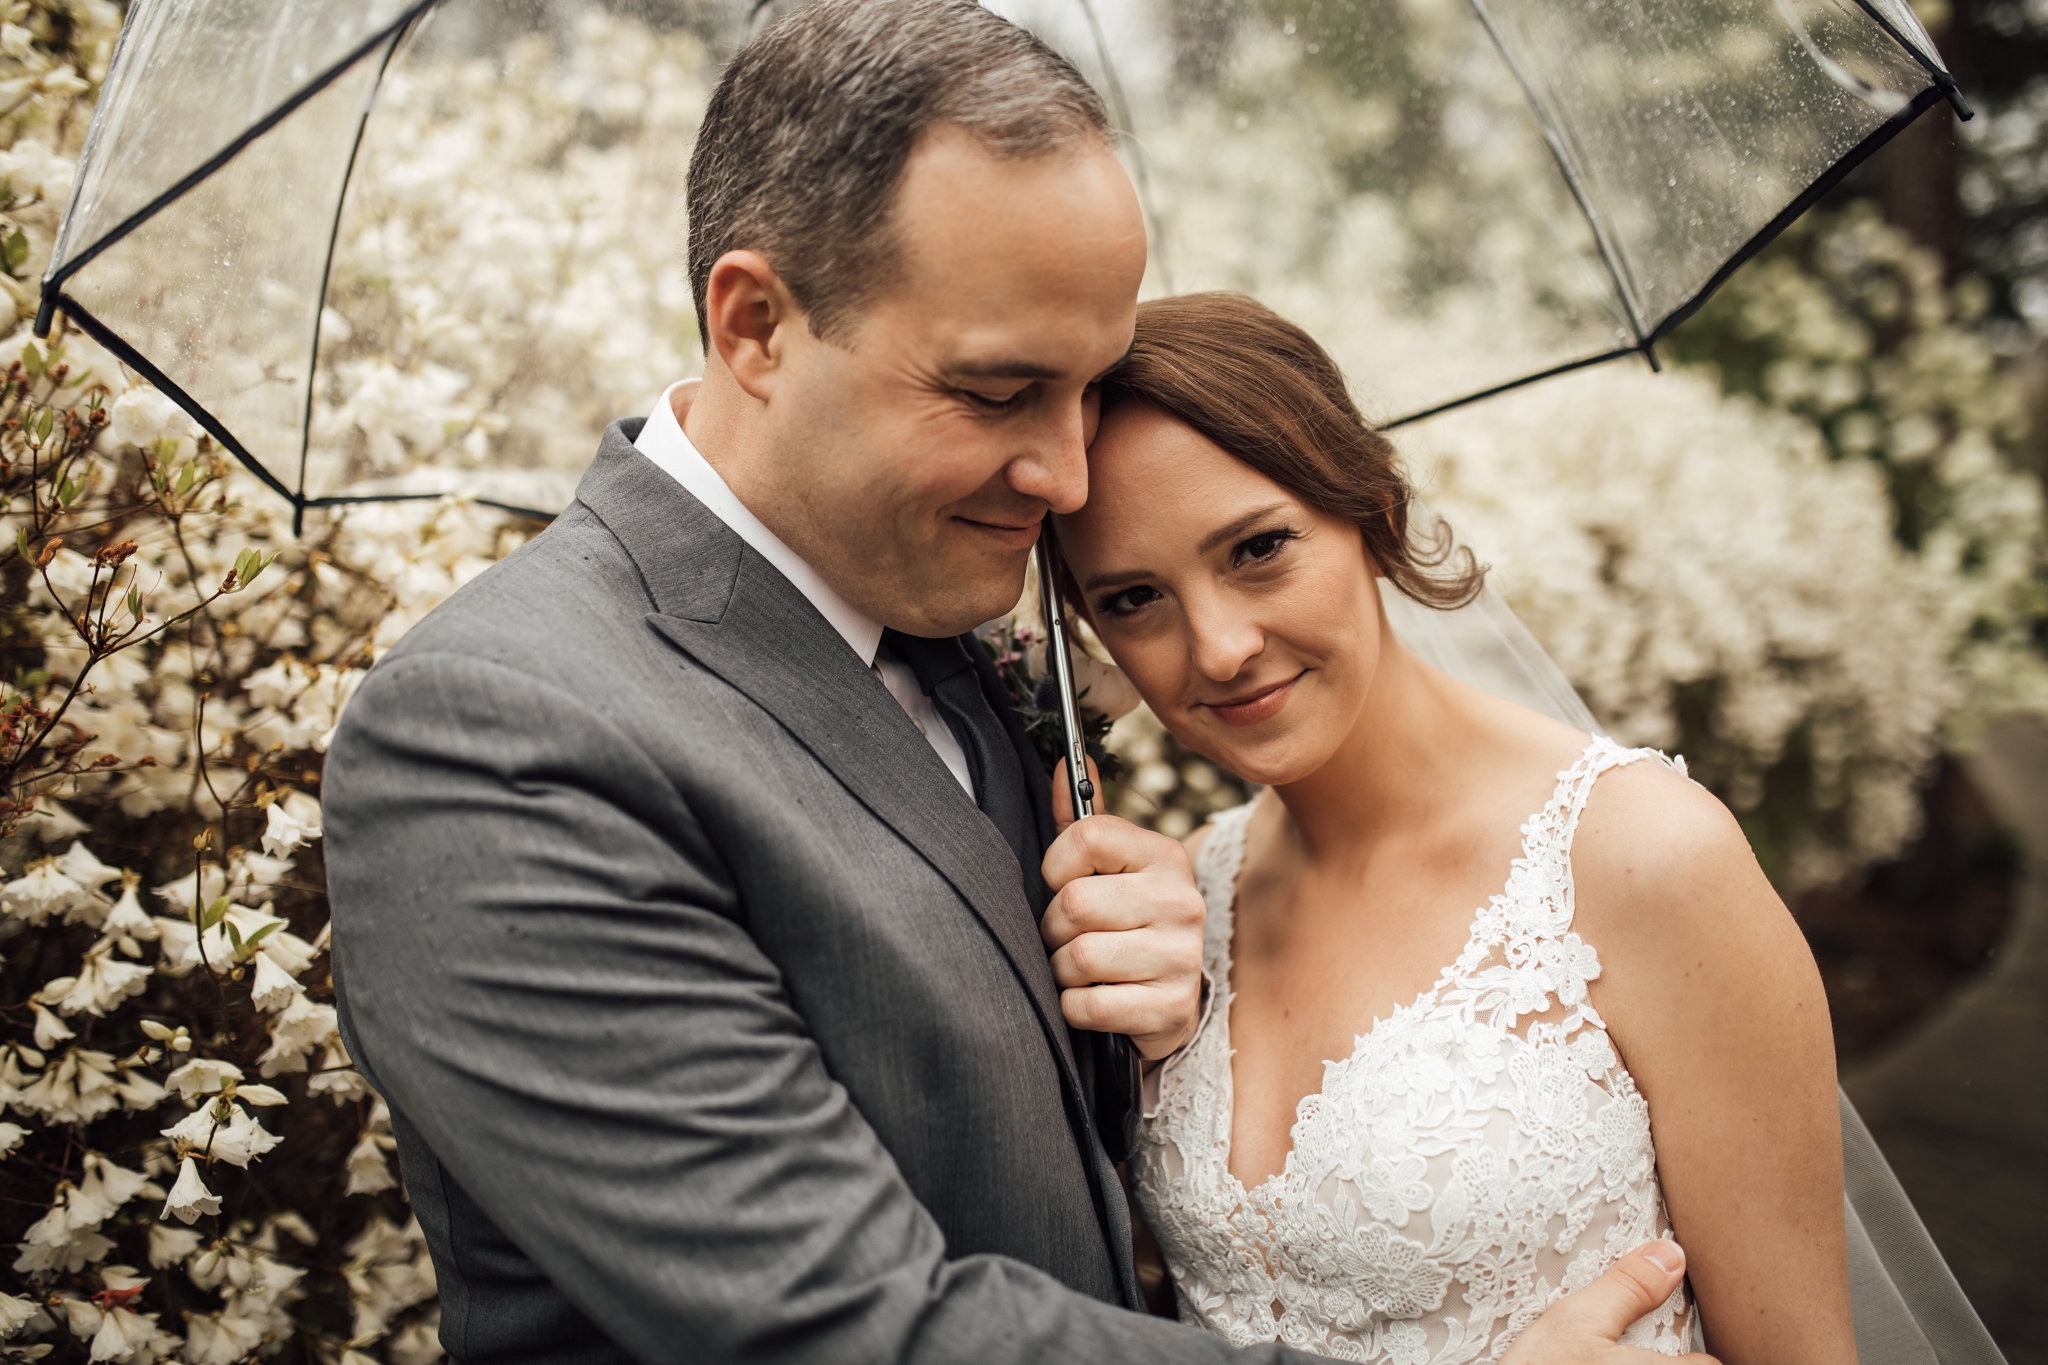 birmingham-alabama-wedding-photographer-laura-terry-the-warmth-around-you (49 of 110).jpg